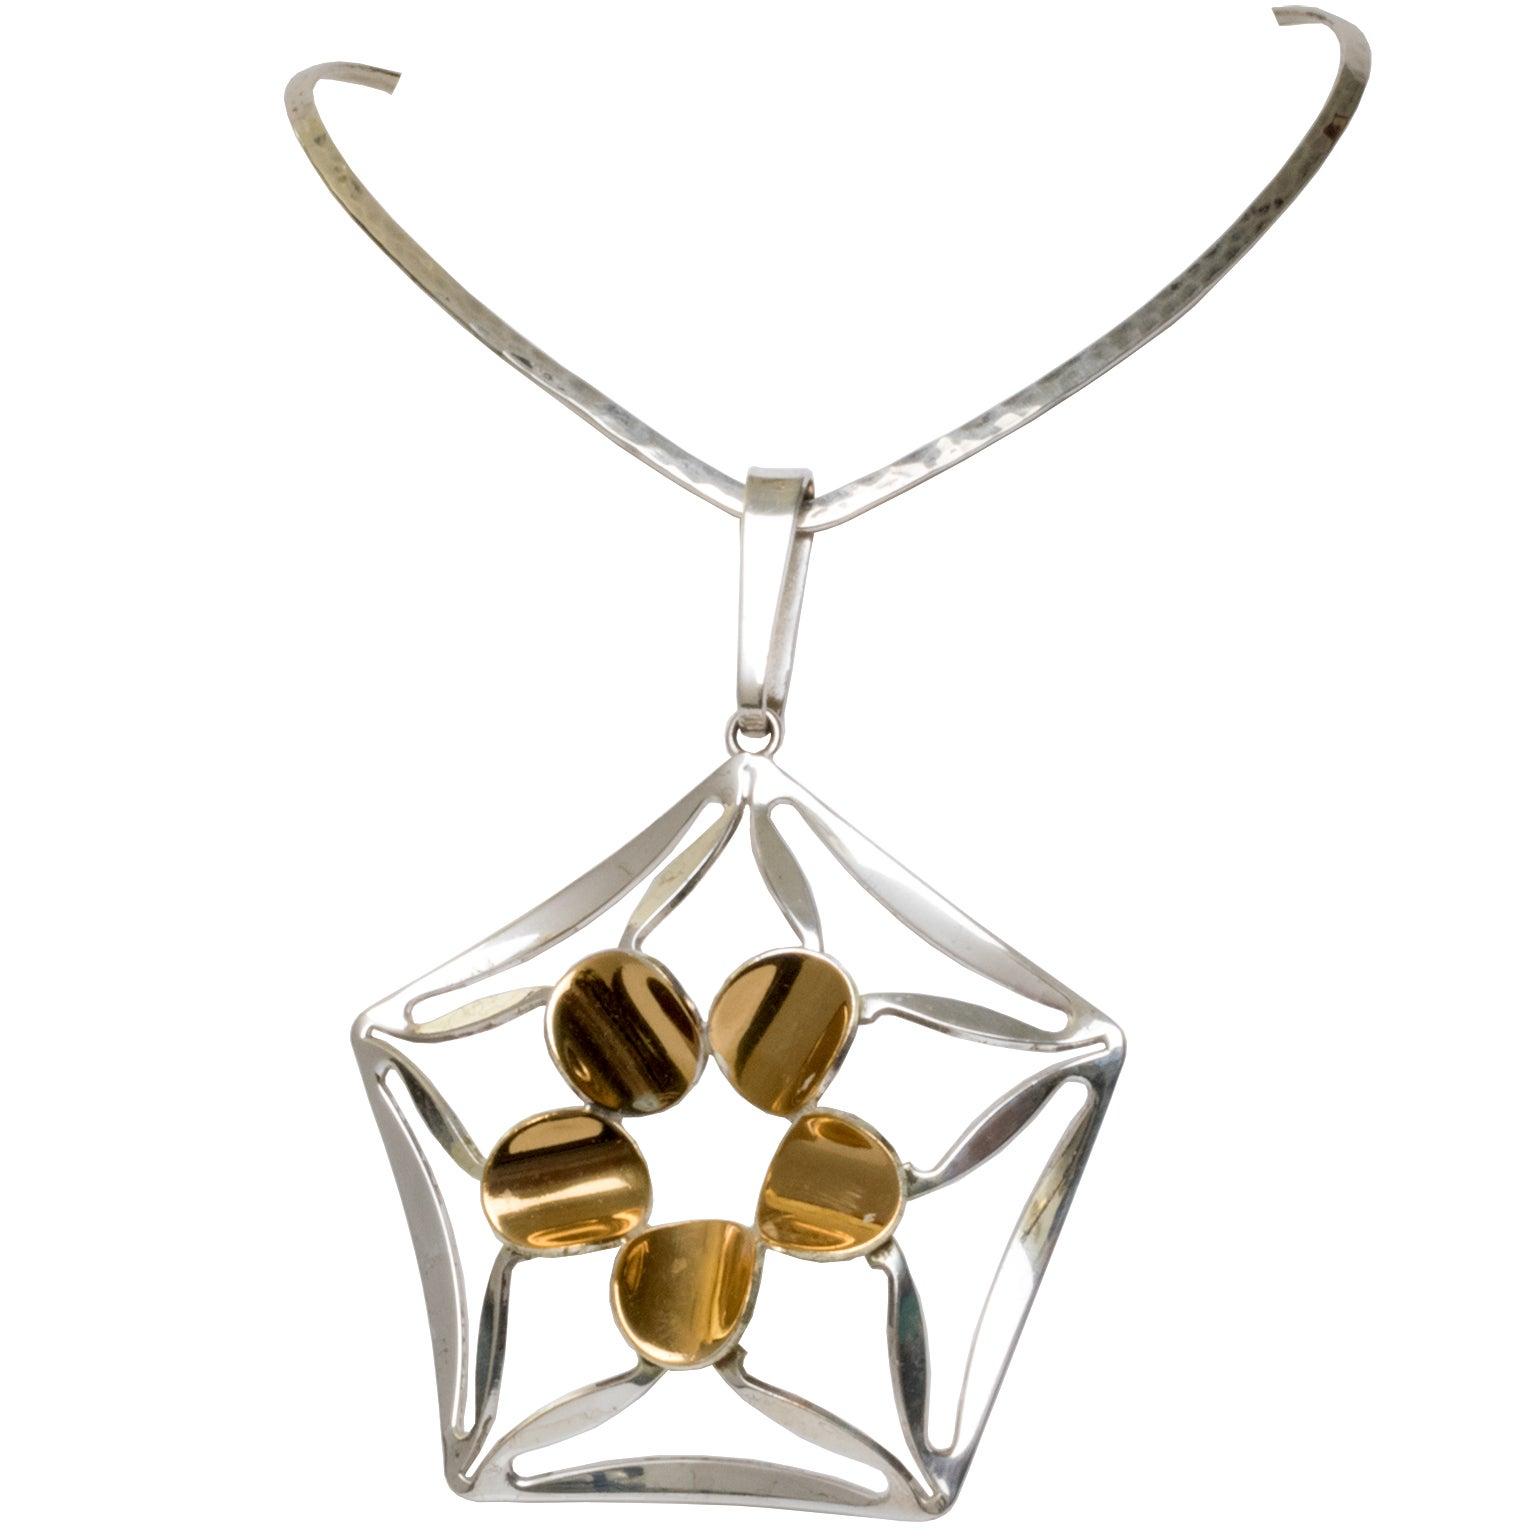 Scandinavian Modern Silver Necklace by K.E. Palmberg for Alton, Falköping